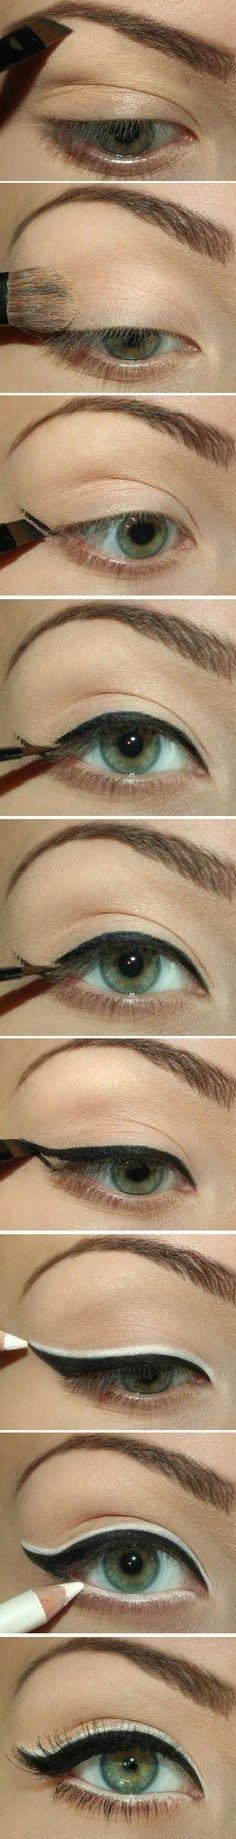 #eyeshadow #tutorial you like